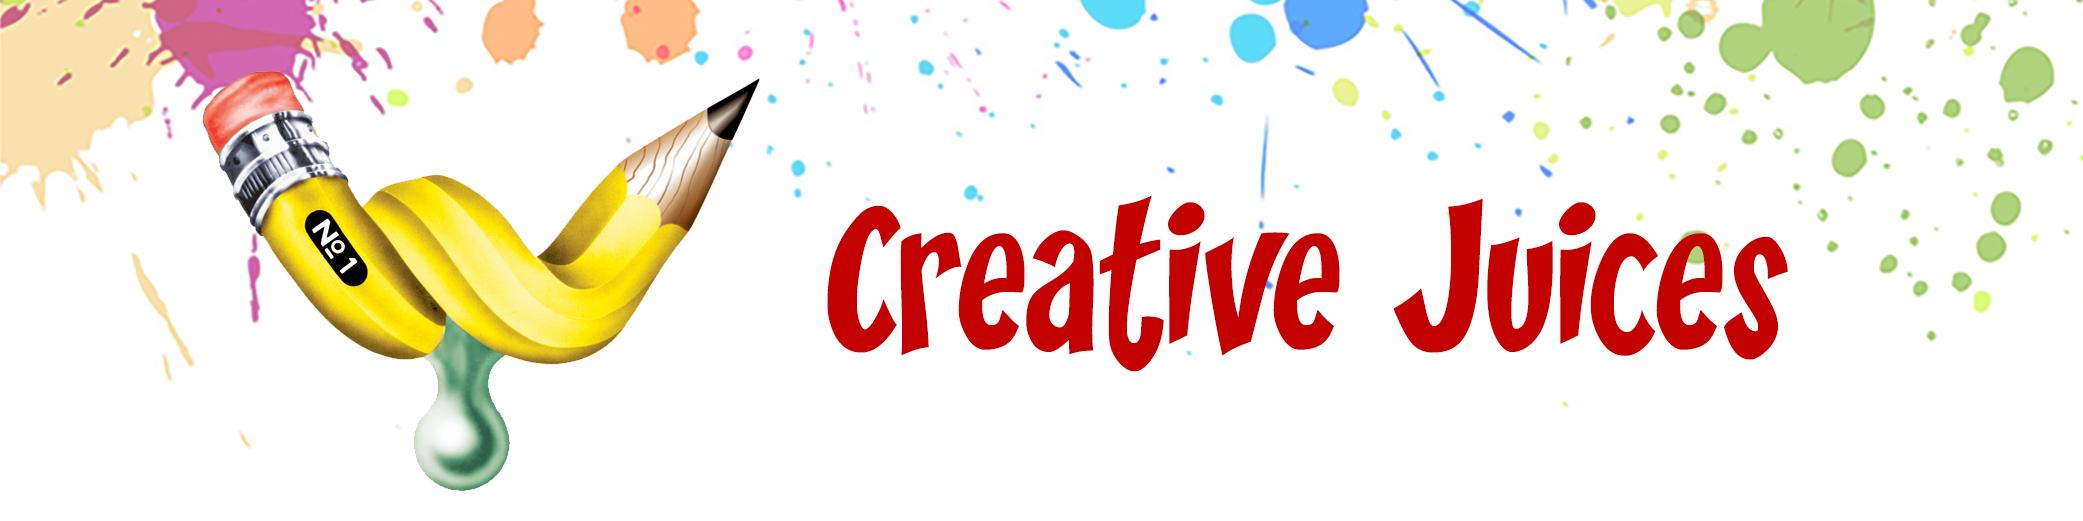 Creative Juices Design